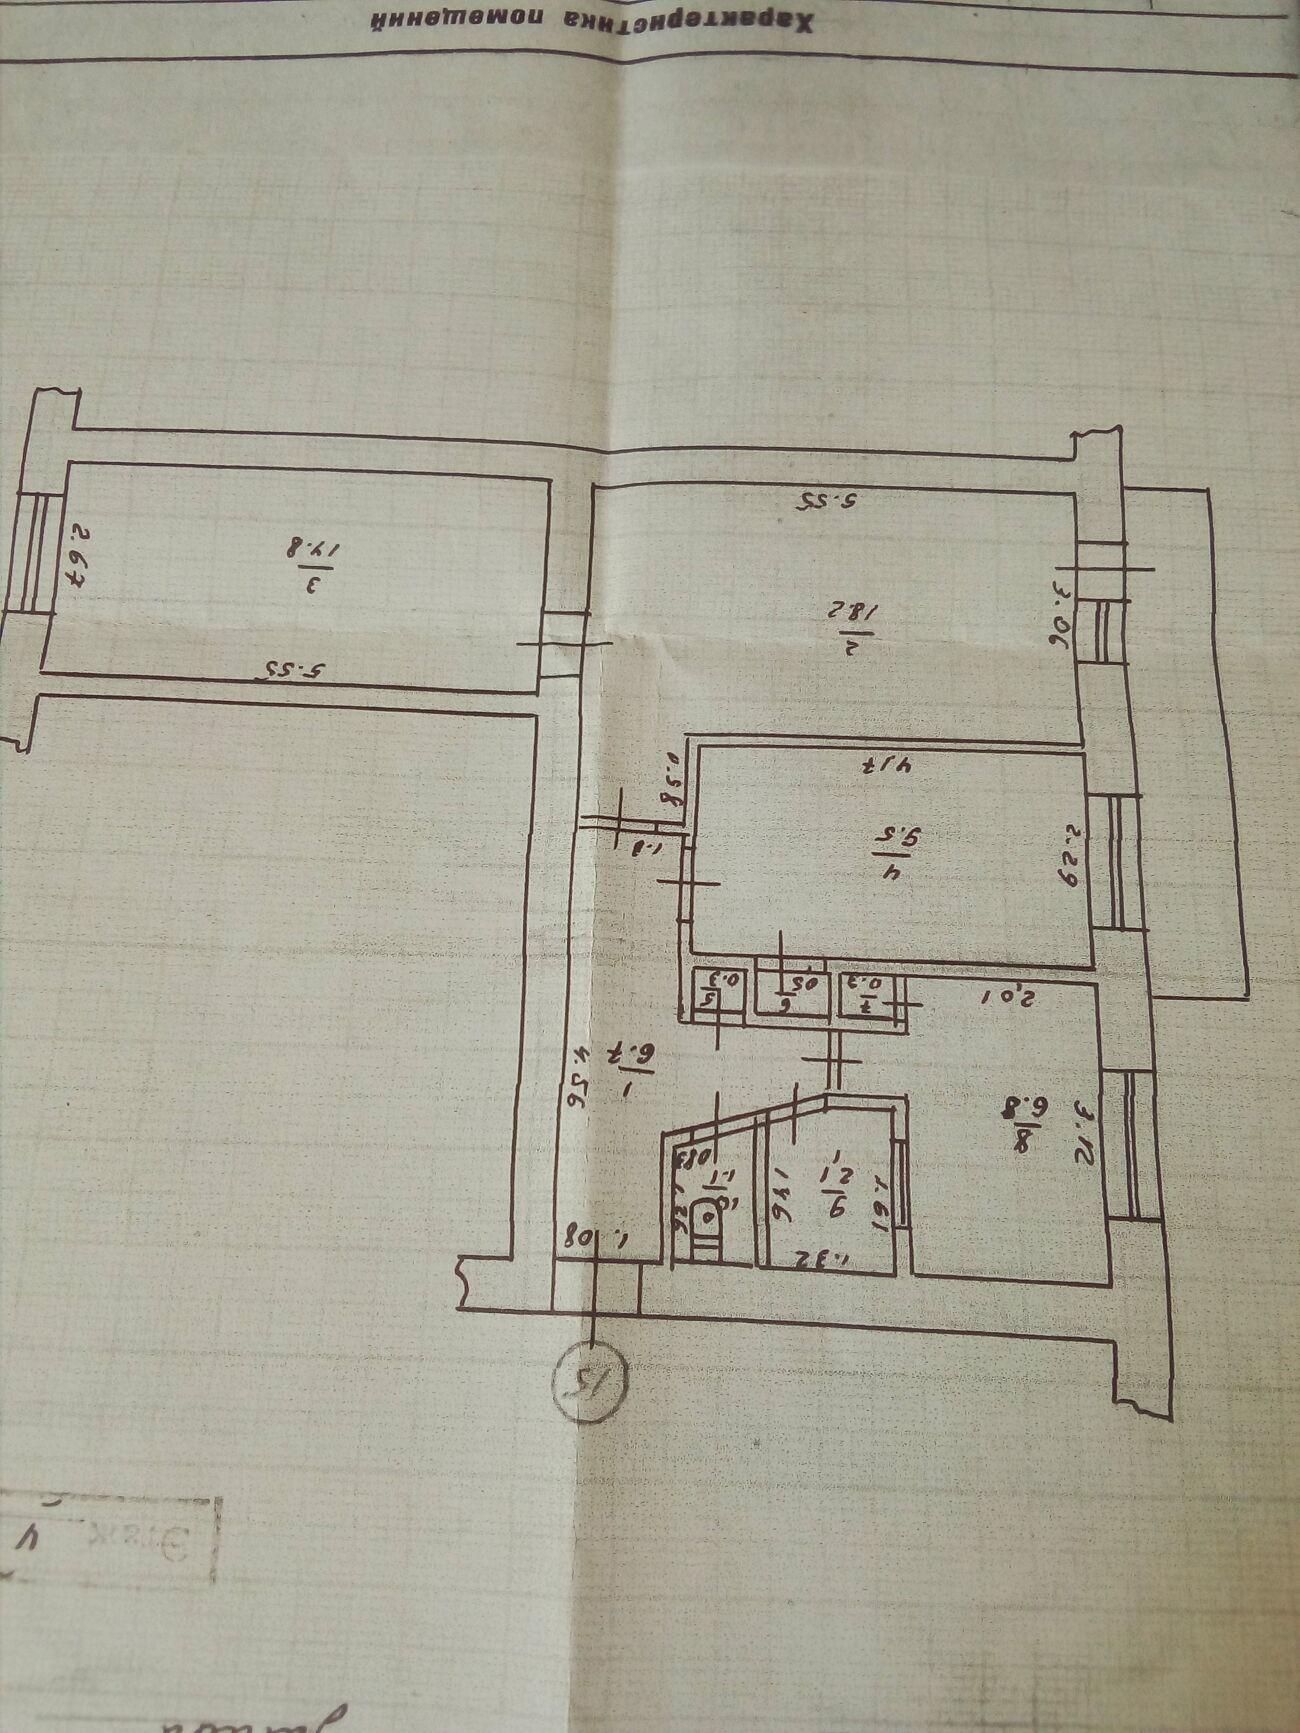 Измаил.Трех-комнатная квартира в районе Гор. поликлиники